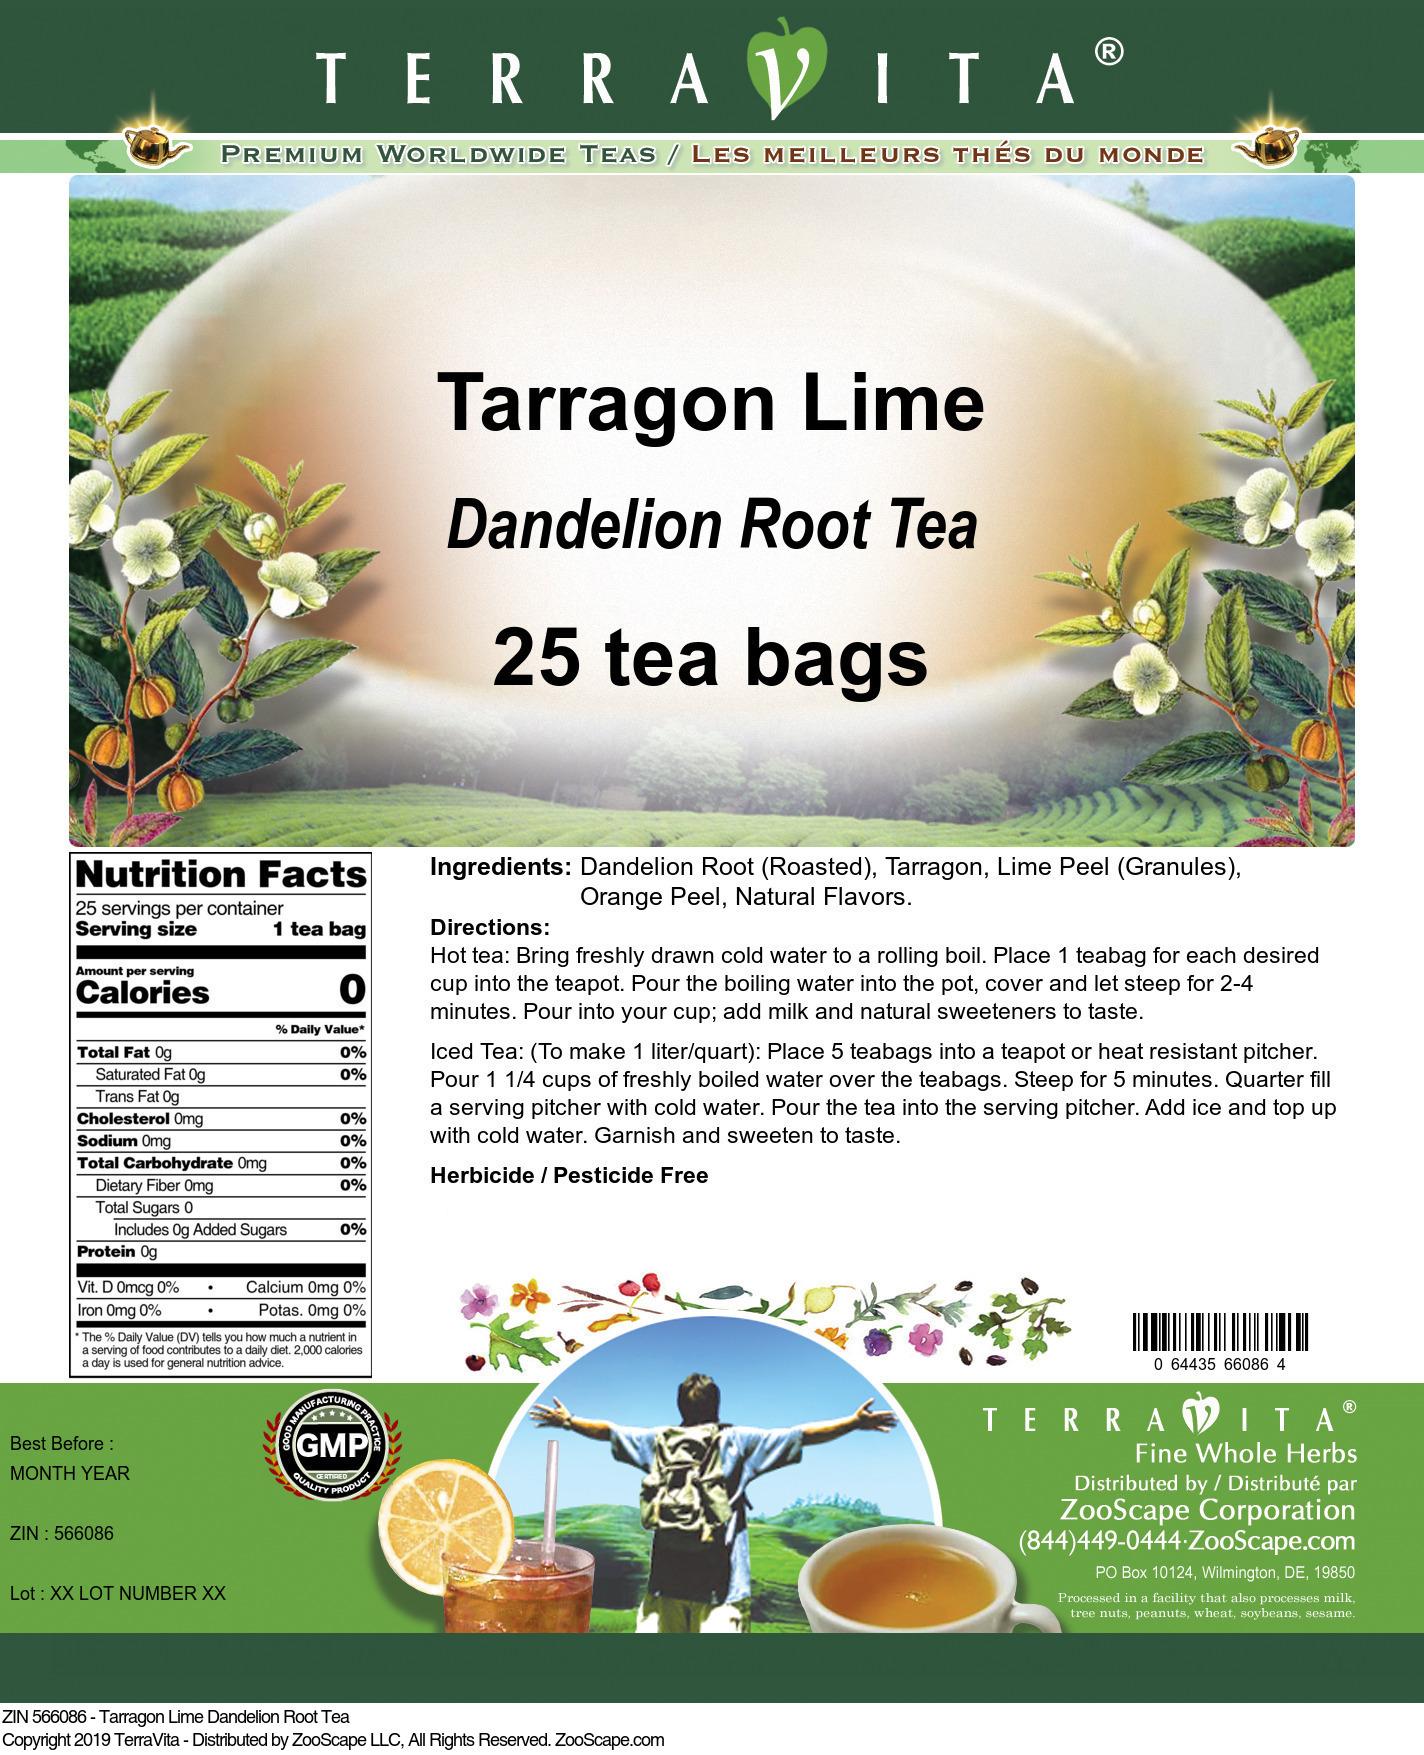 Tarragon Lime Dandelion Root Tea